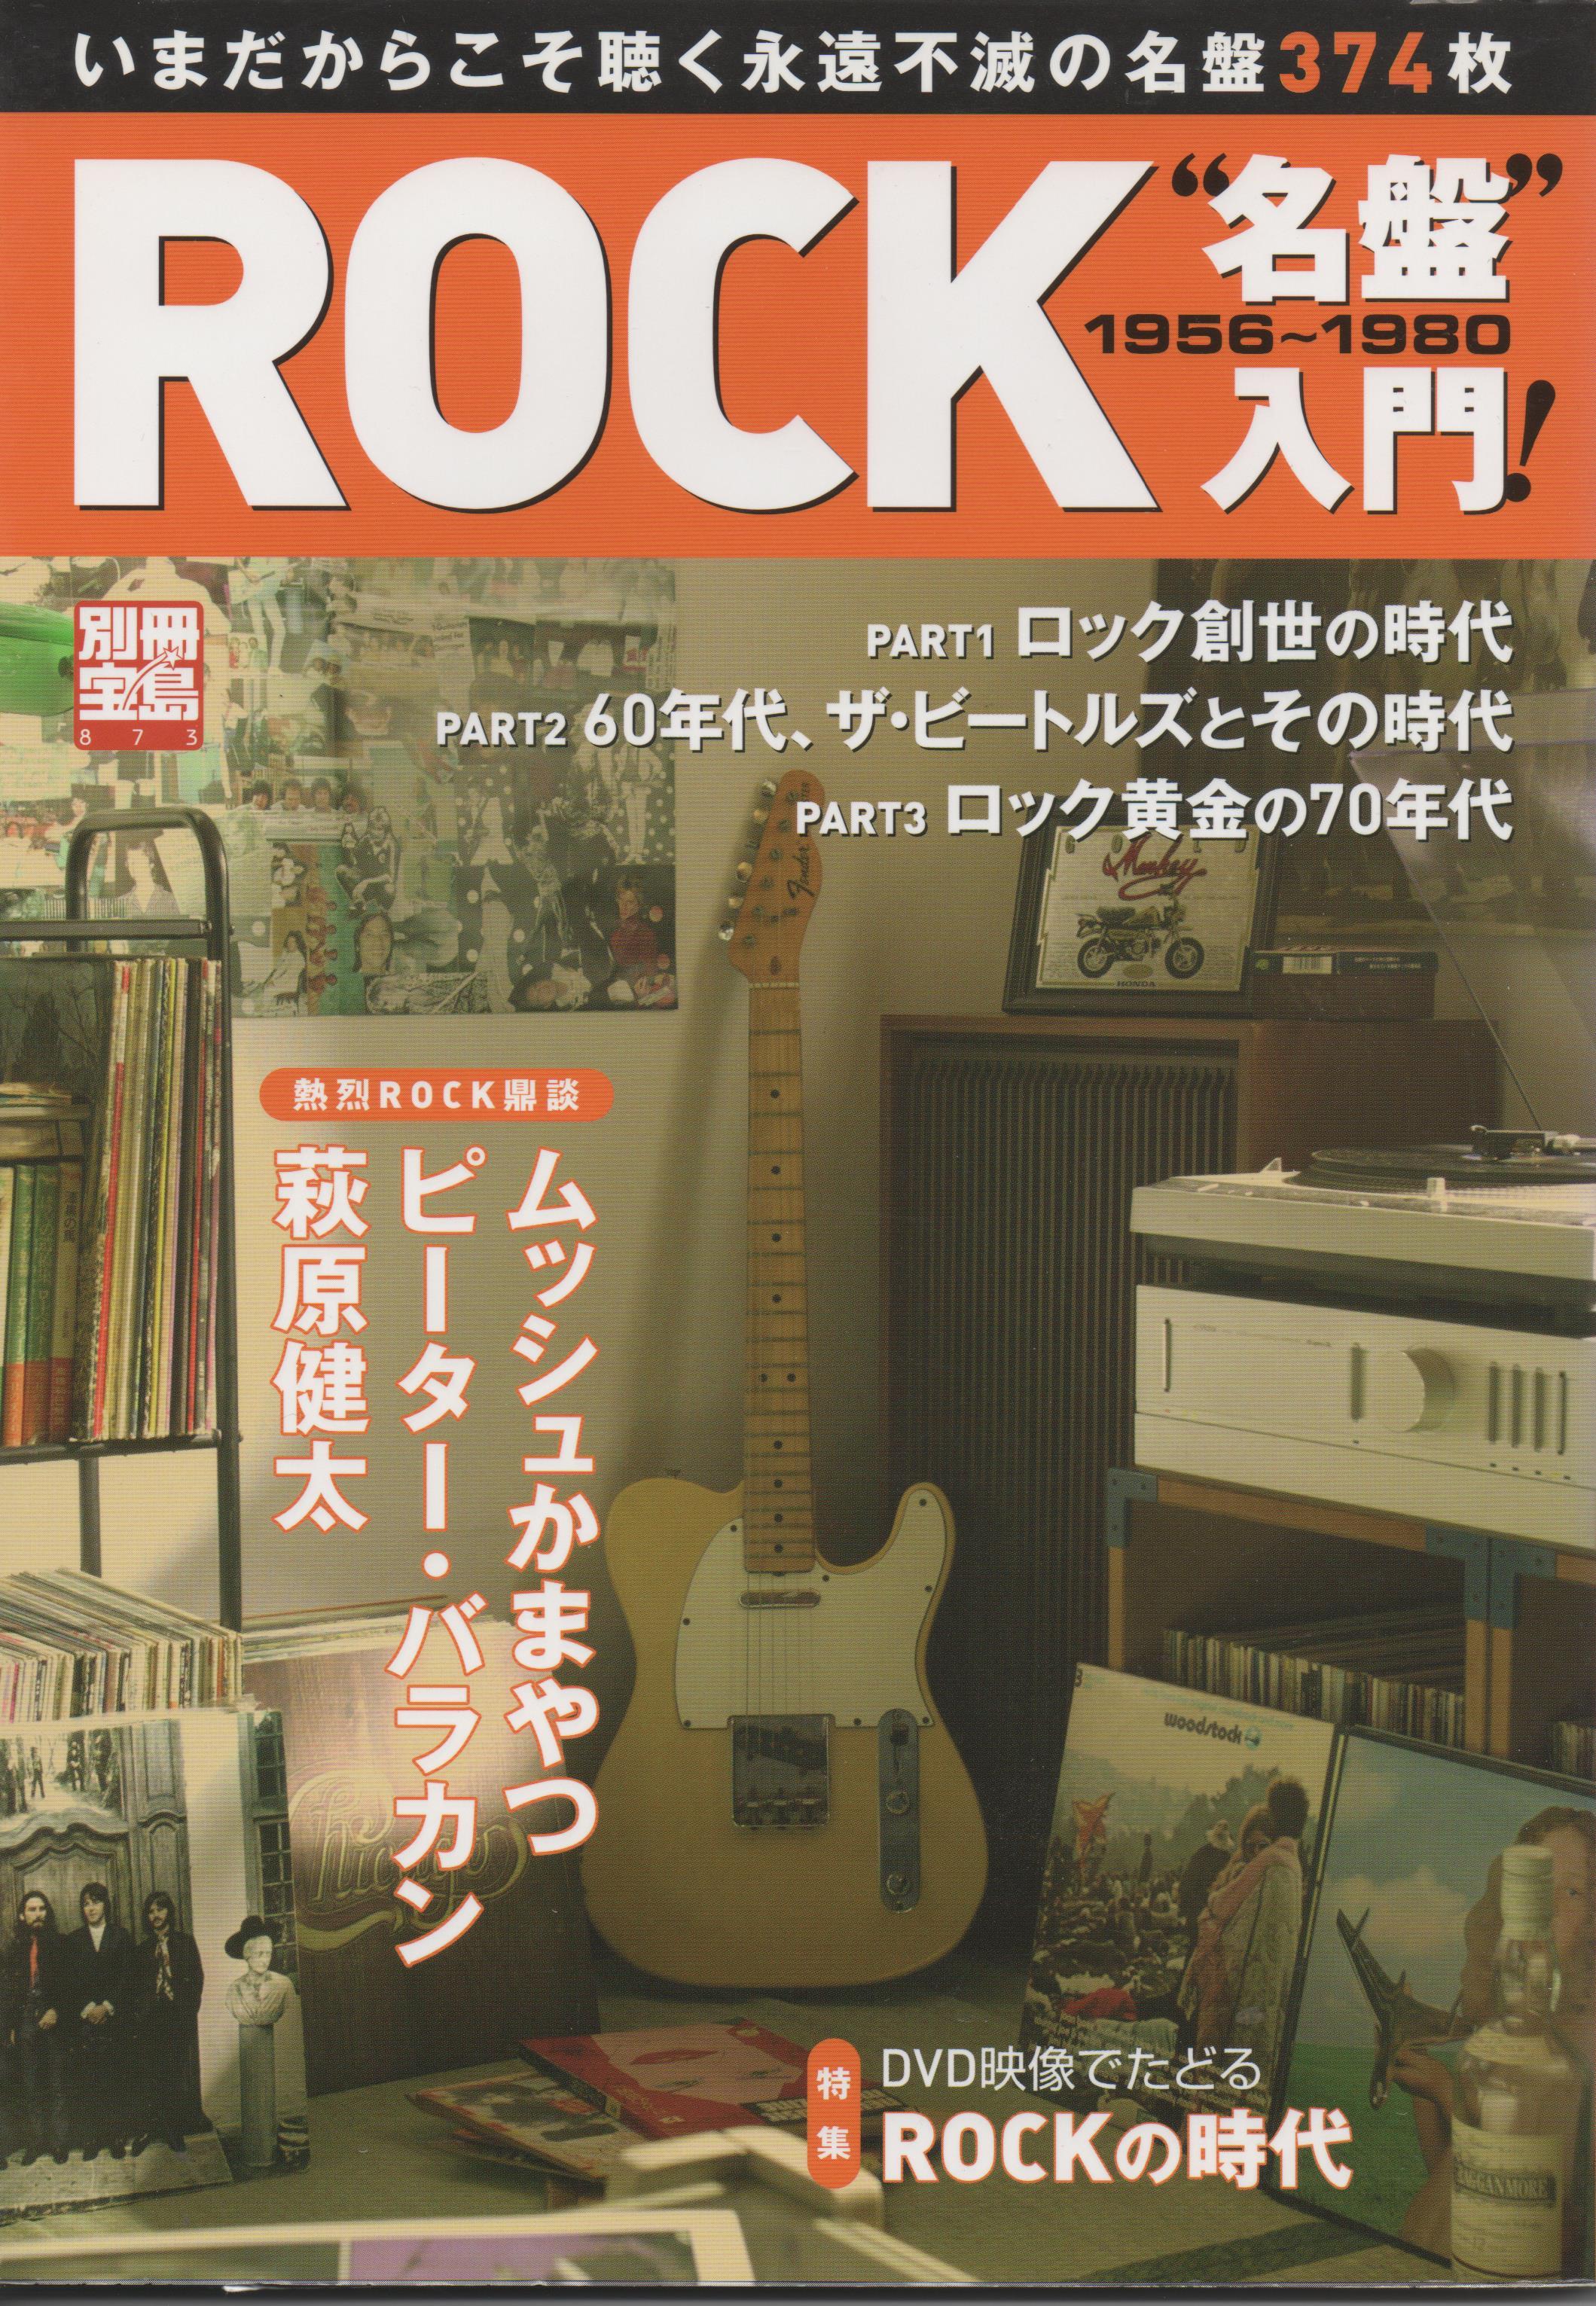 『ROCK'名盤'入門』